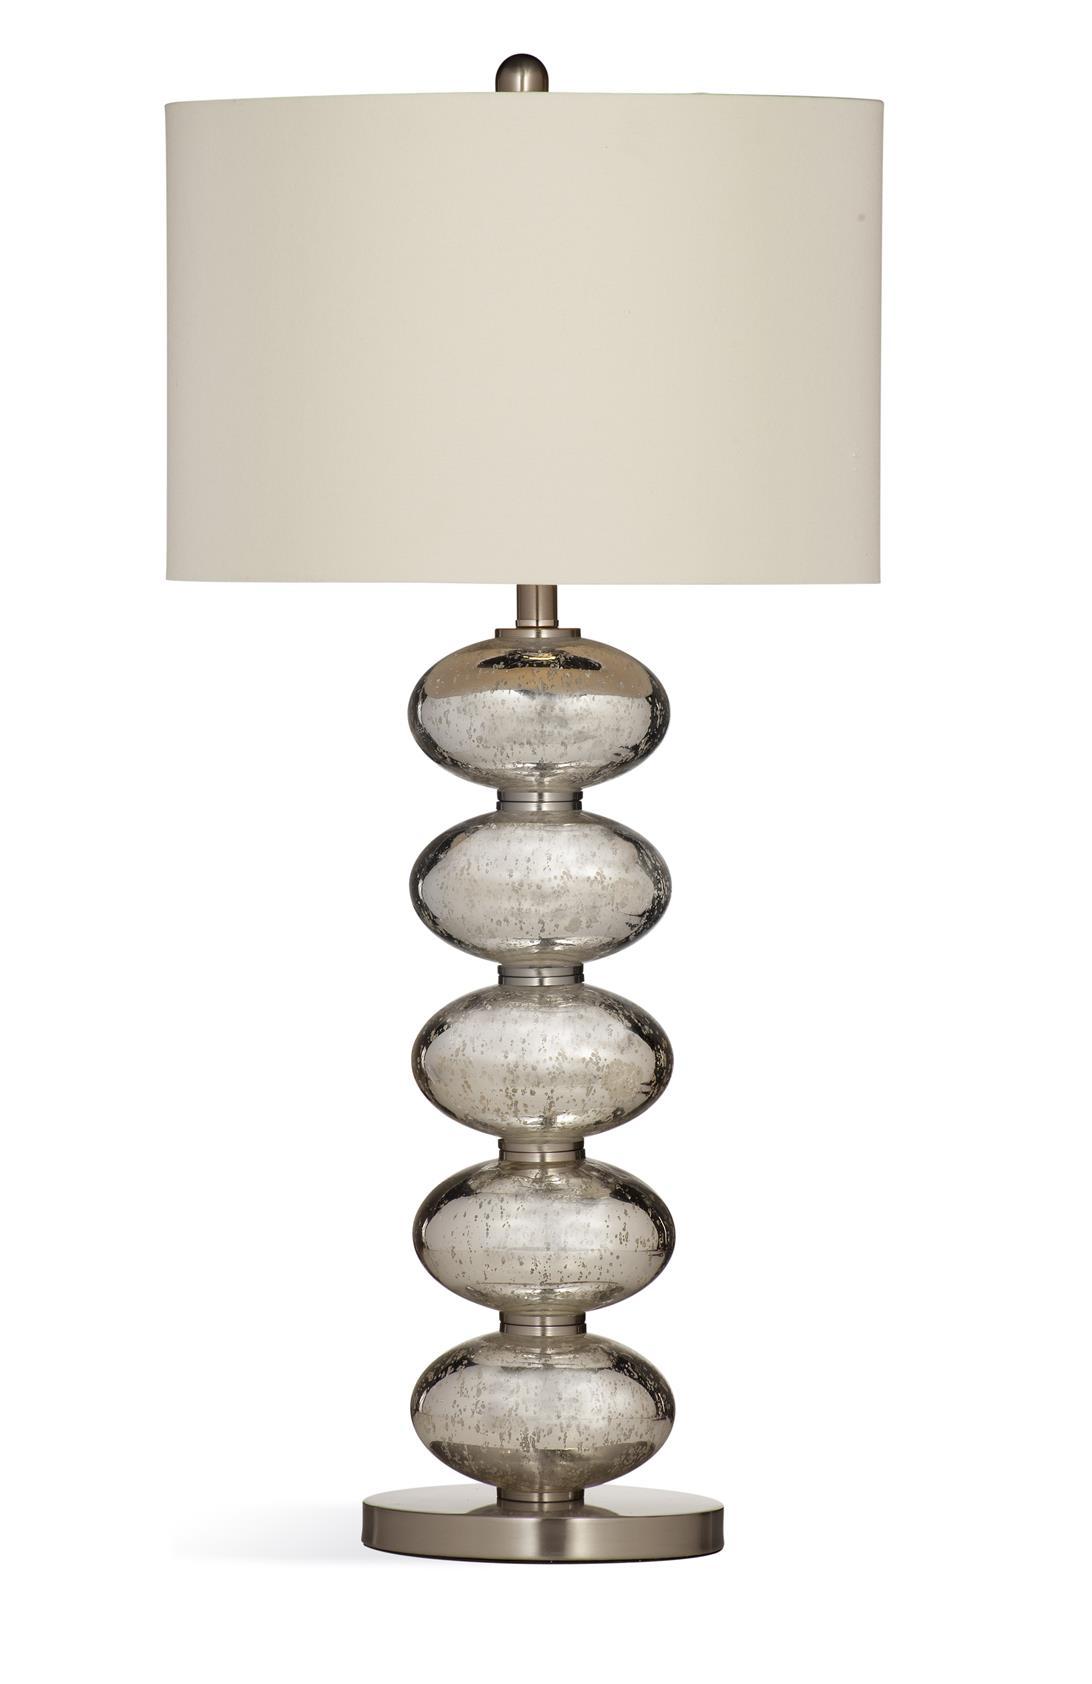 Bassett mirror maxine table lamp tanga for Nfpa 99 table 5 1 11